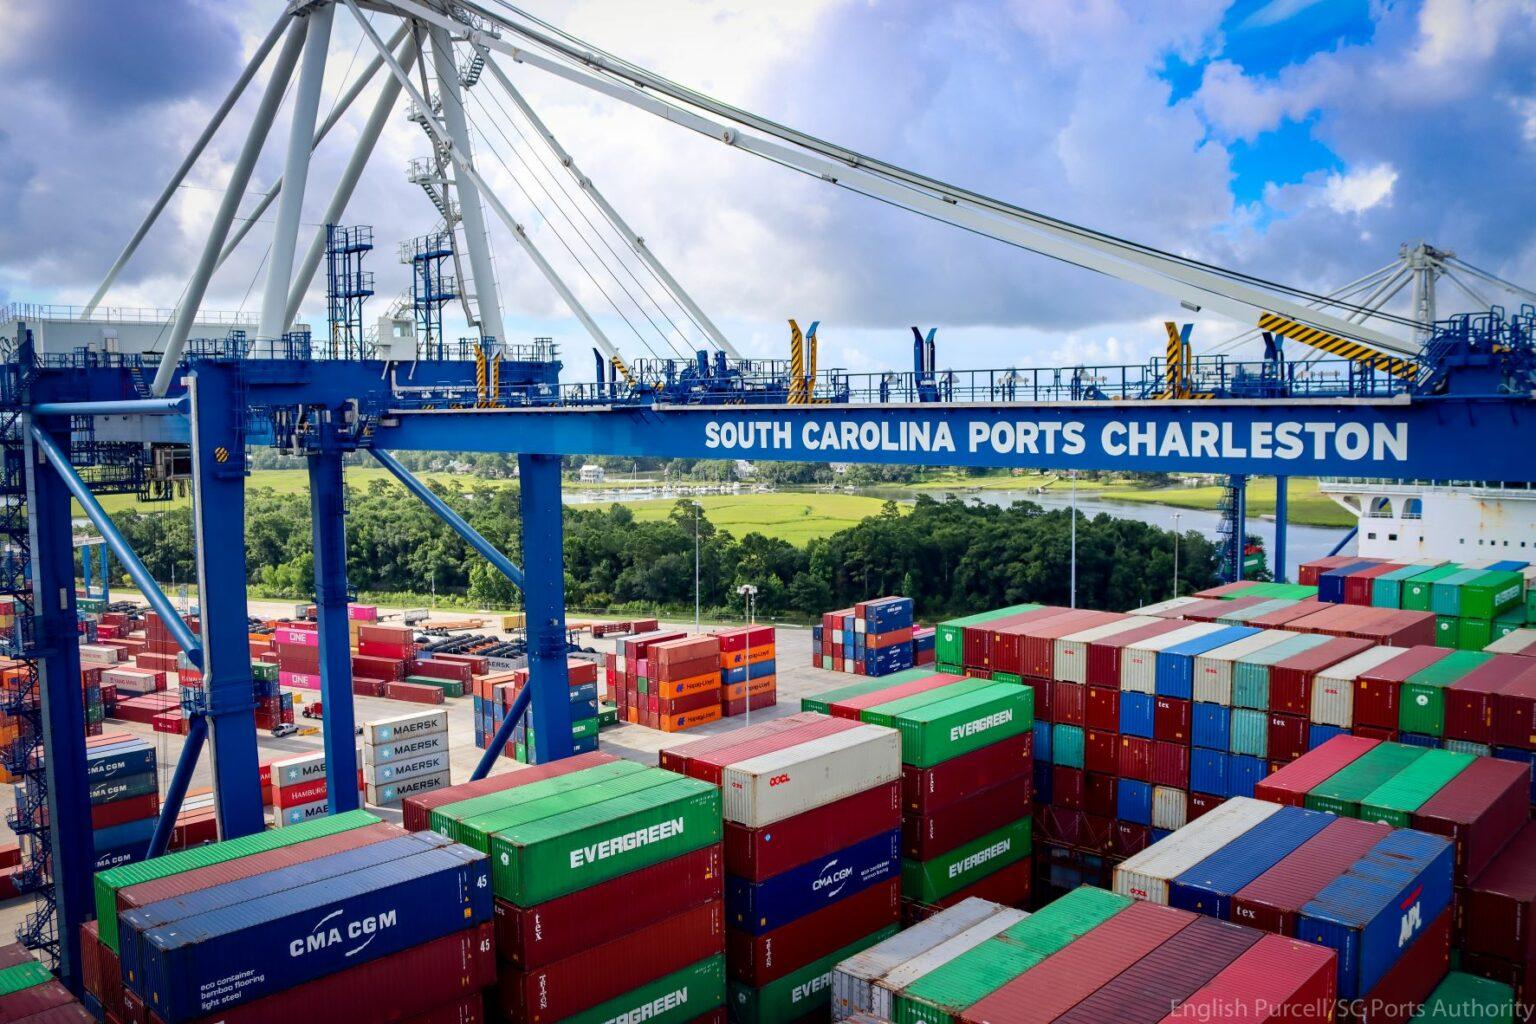 ship-at-sc-ports-photo-credit-scpa-english-purcell-sm-1536x1024